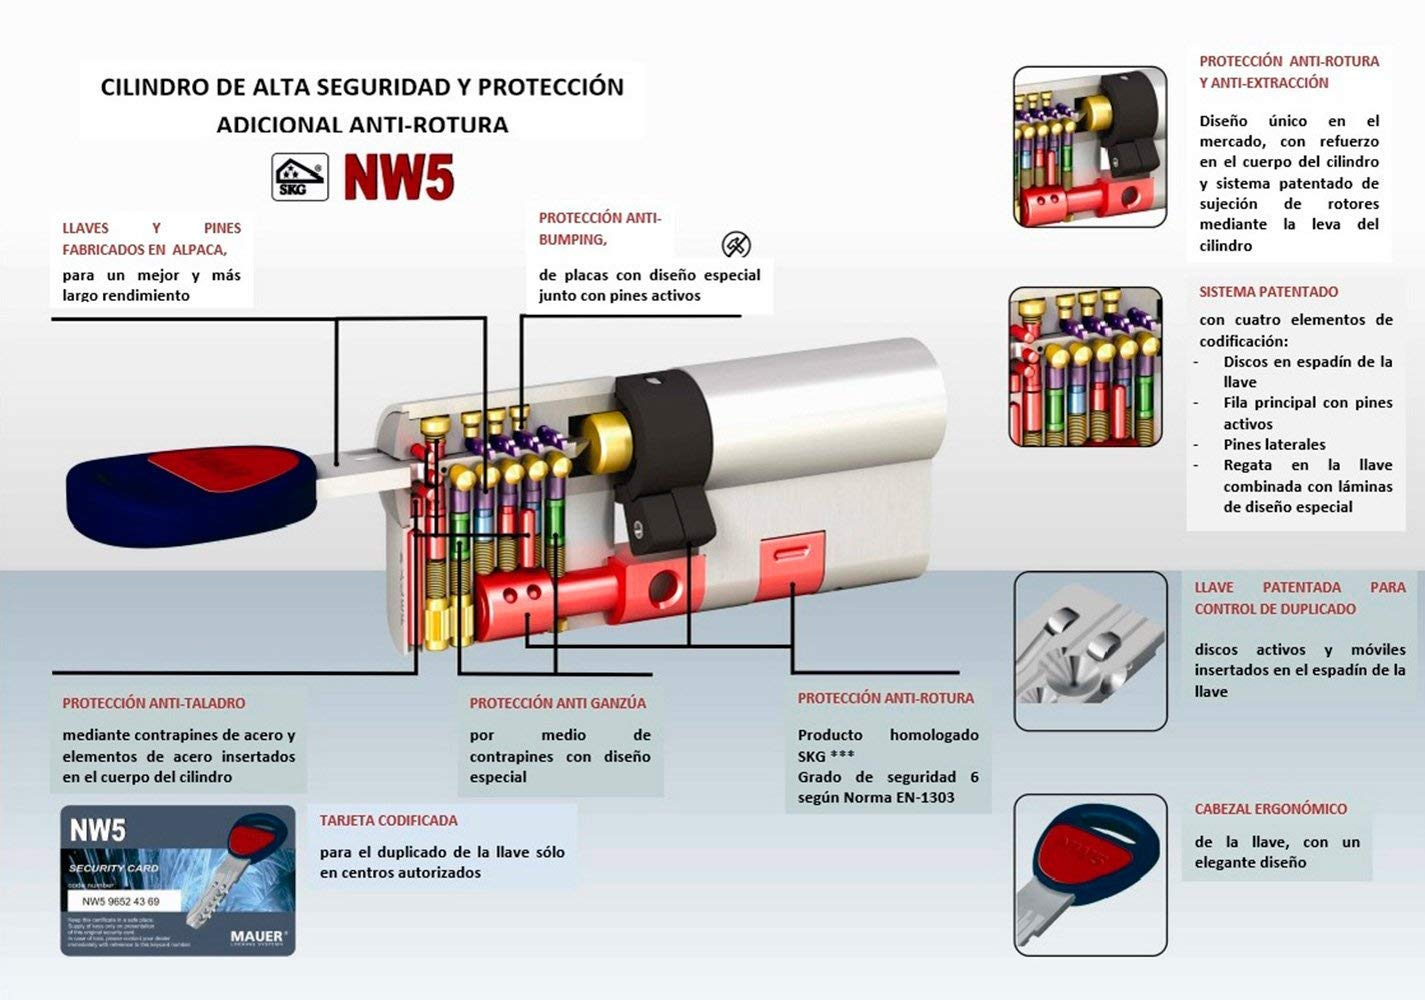 MAUER NW5 31x31 DOBLE EMBRAGUE Bombin de Seguridad Color LATON Reforzado Antirotura Antibumping Antitaladro Leva Antiextracción Cerradura para Puerta 5 ...